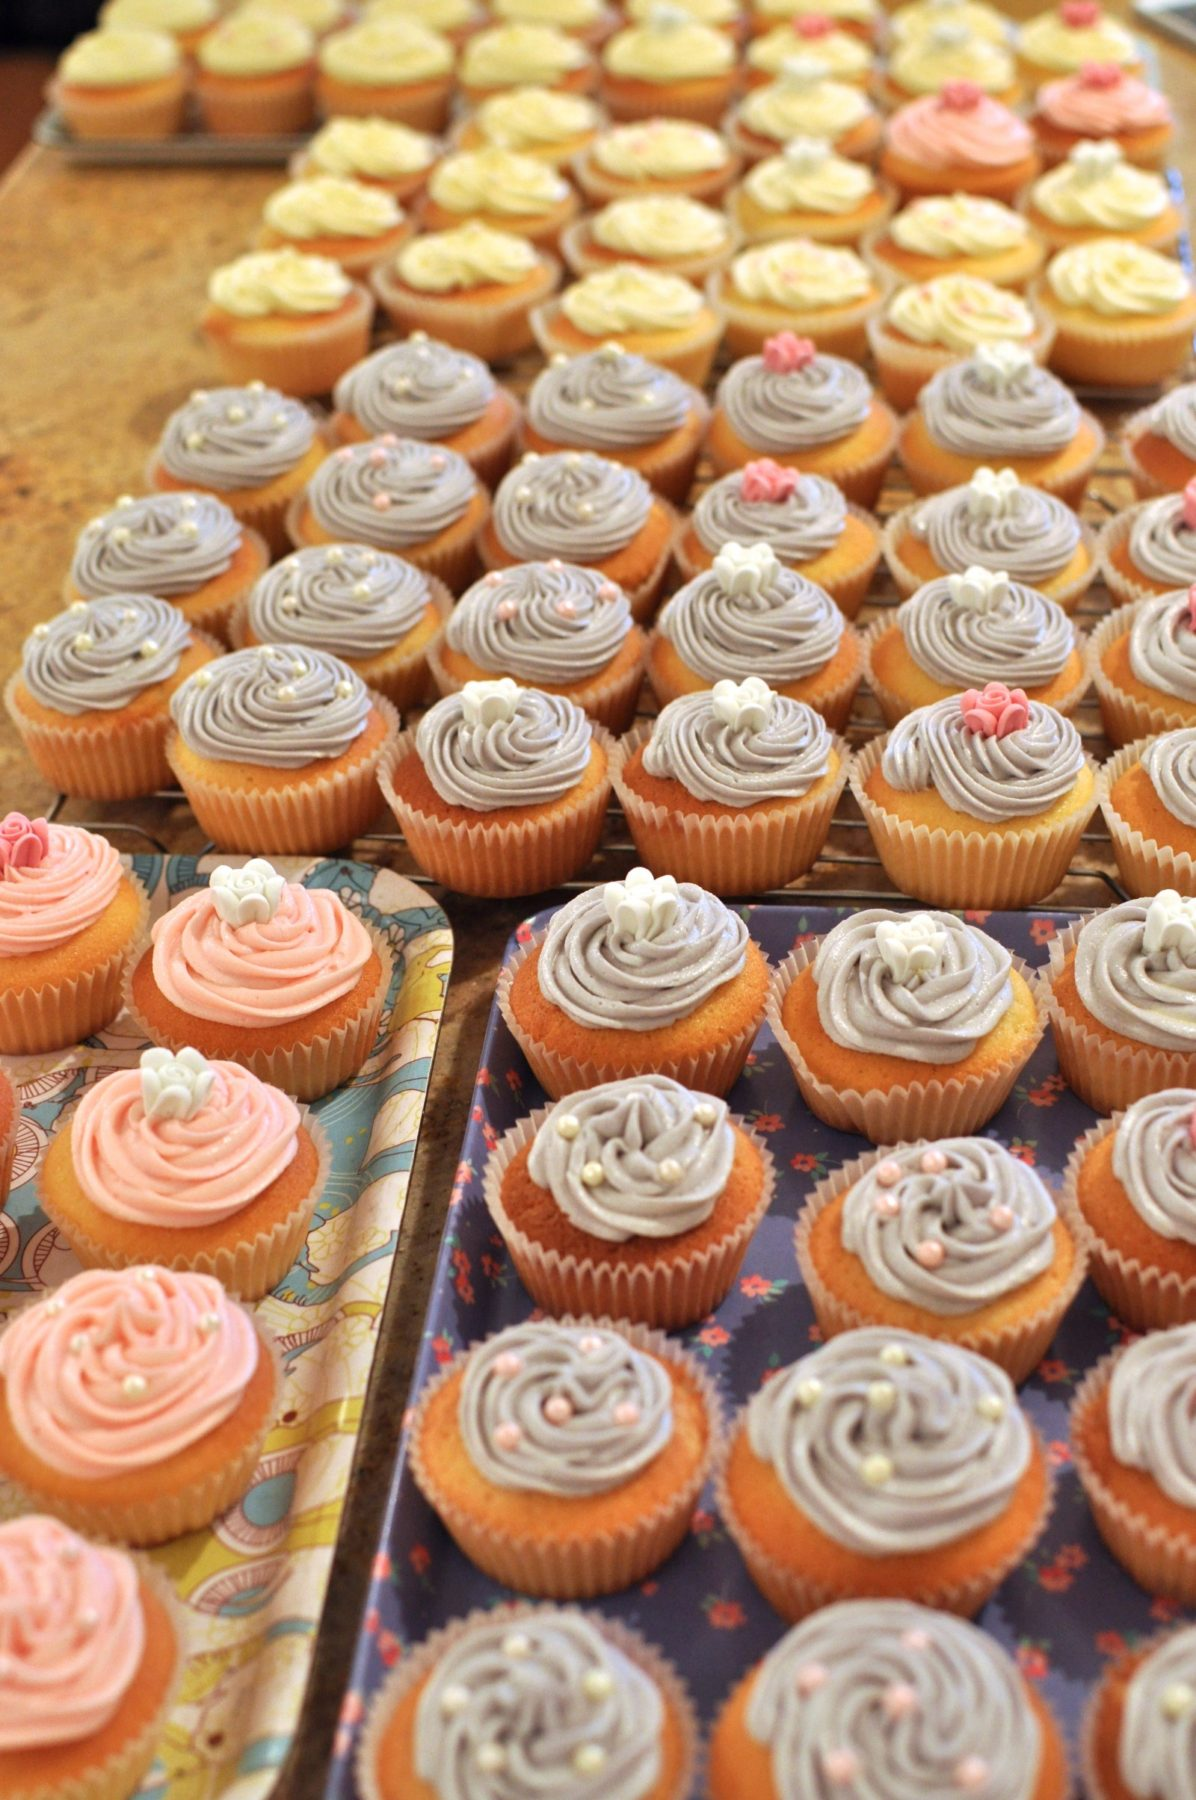 Baking wedding cupcakes – 100 of them!